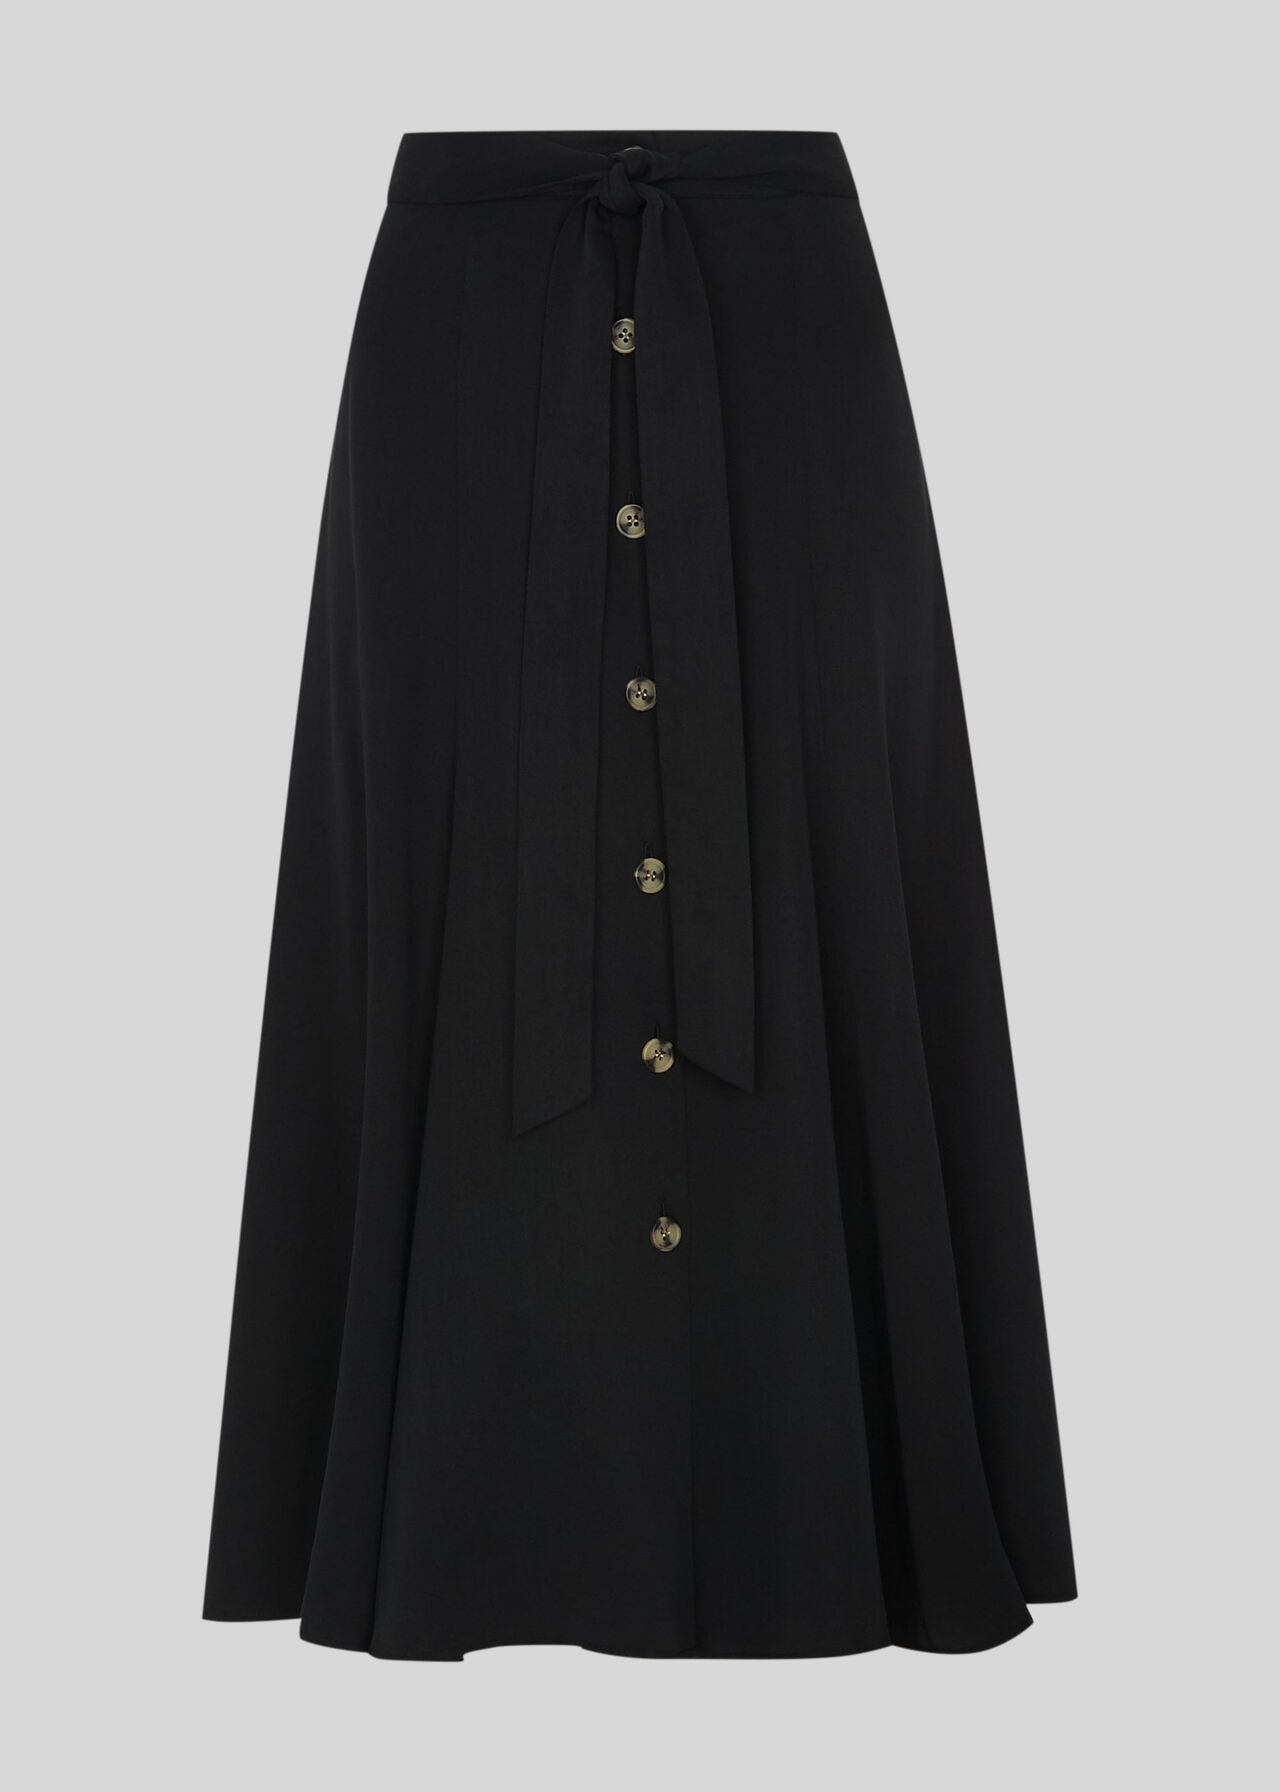 Marissa Button Through Skirt Black